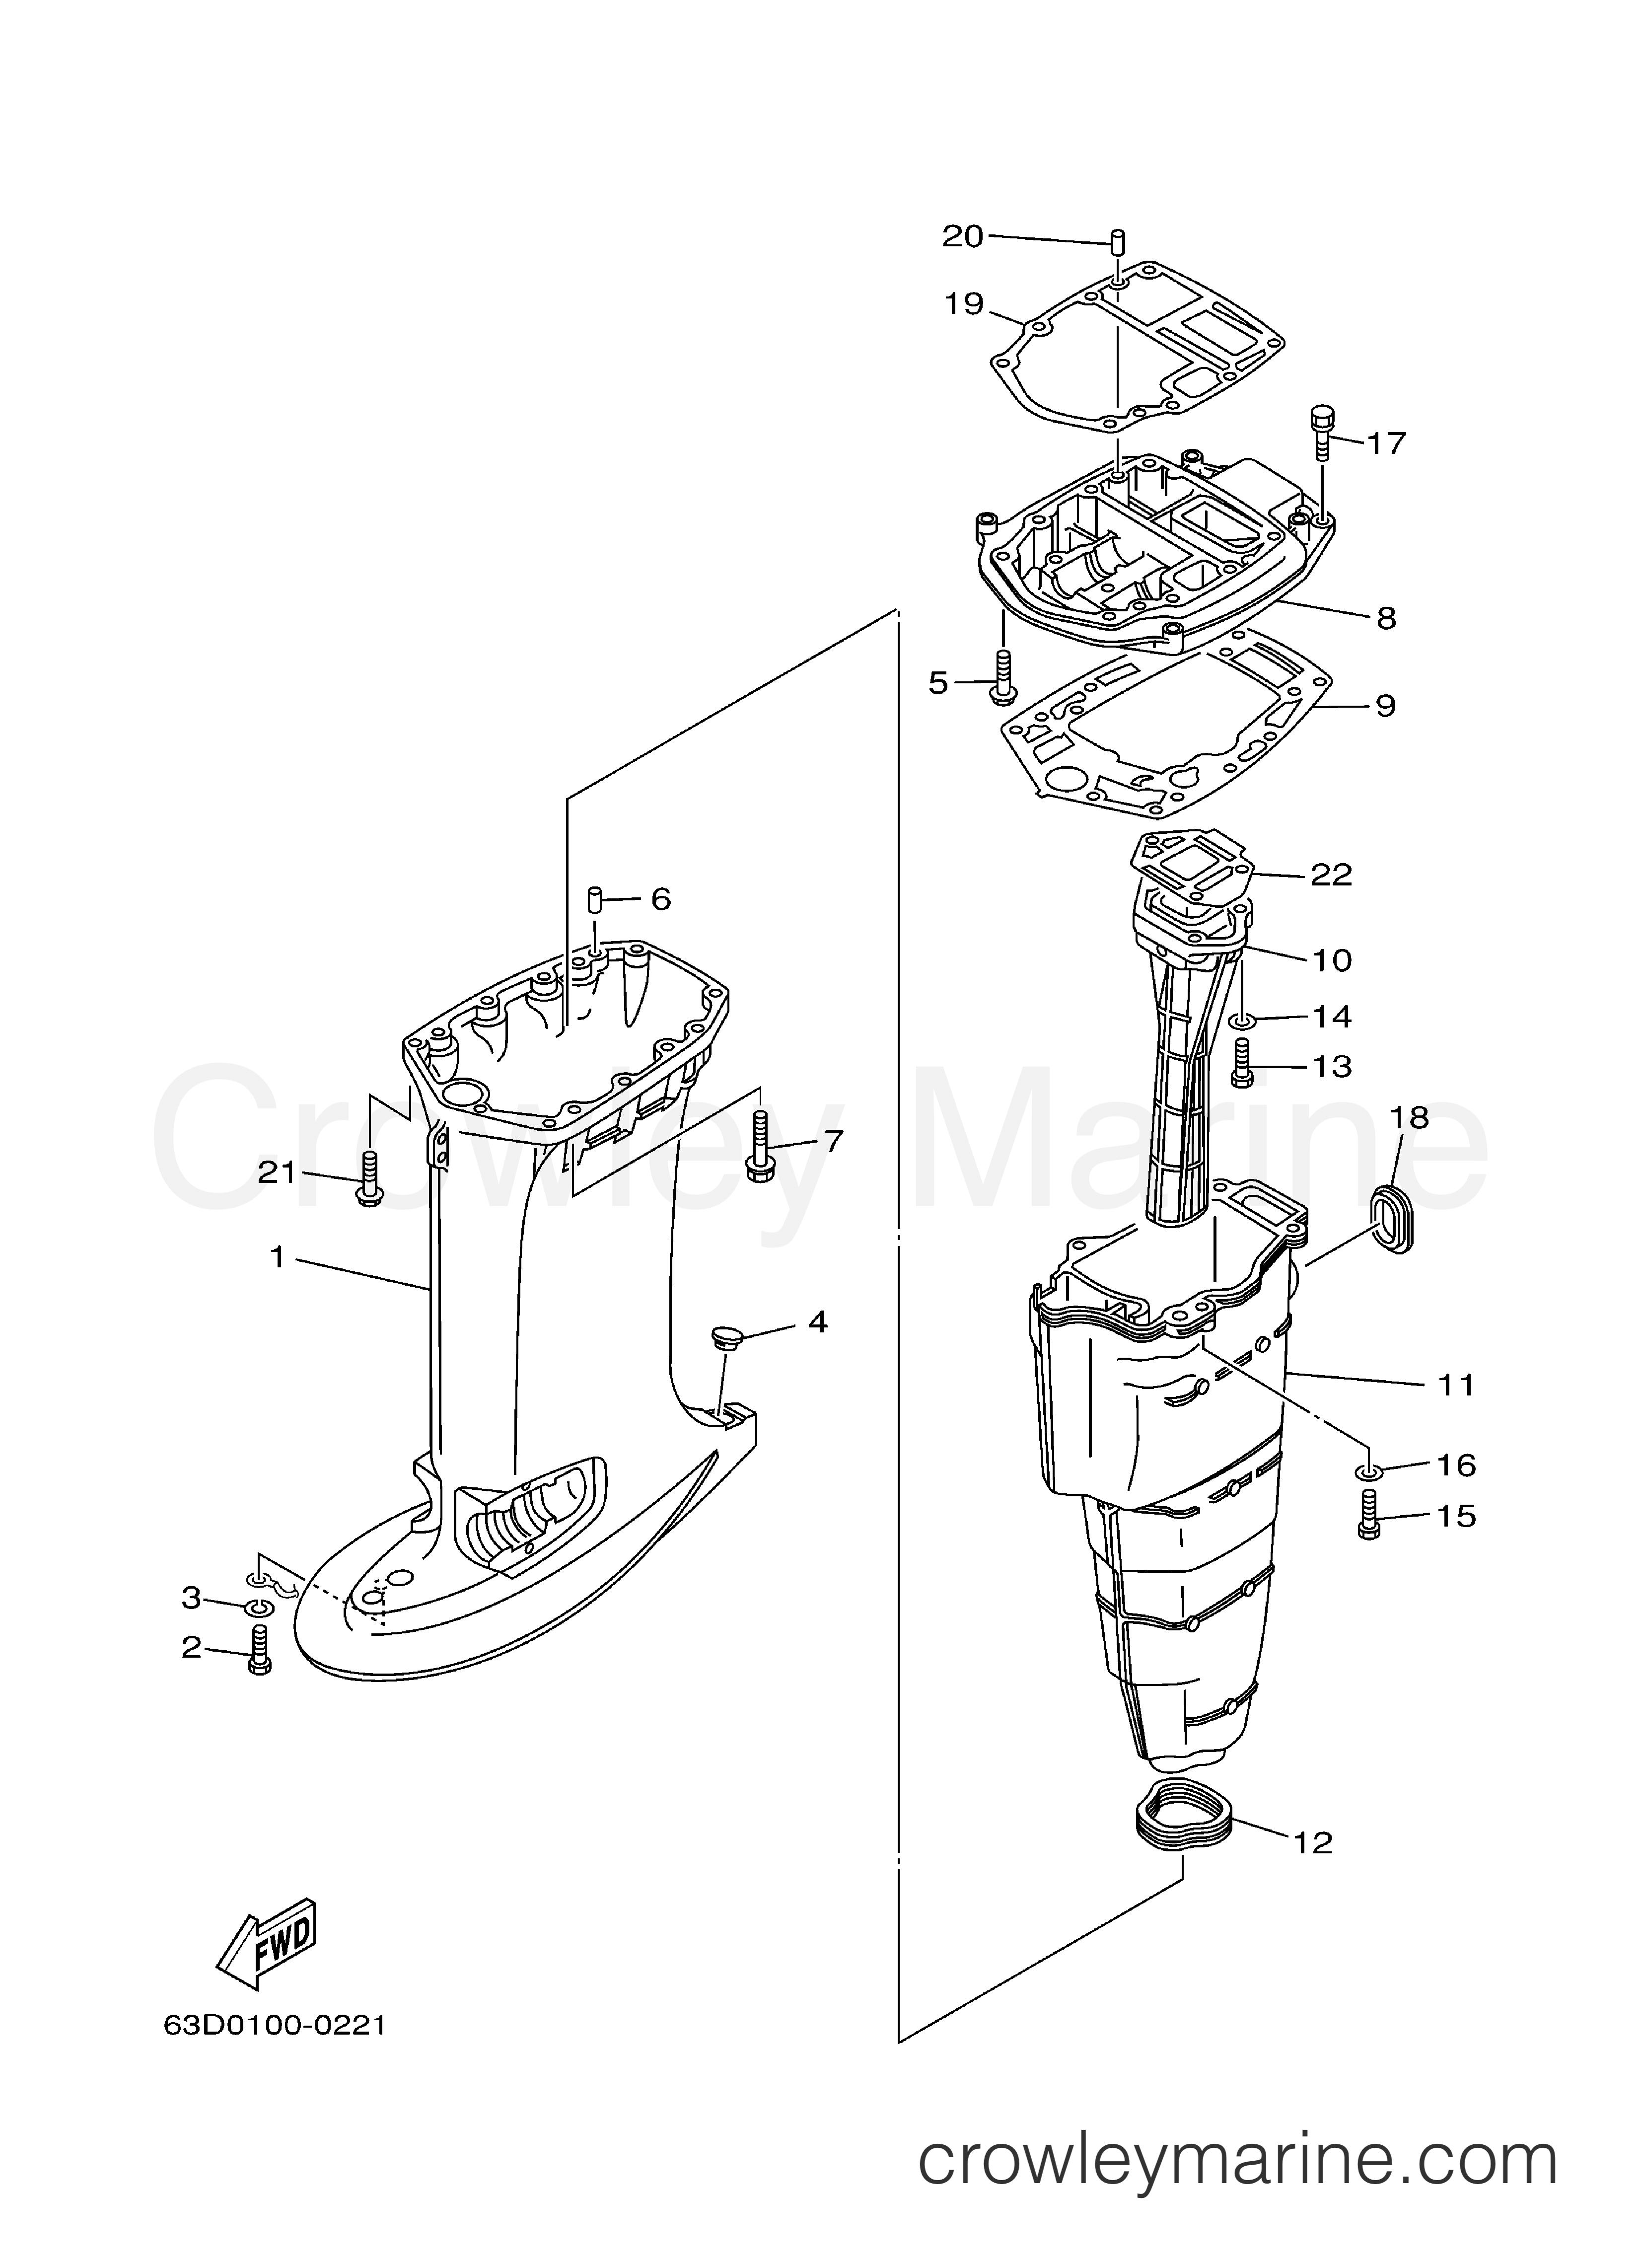 upper casing